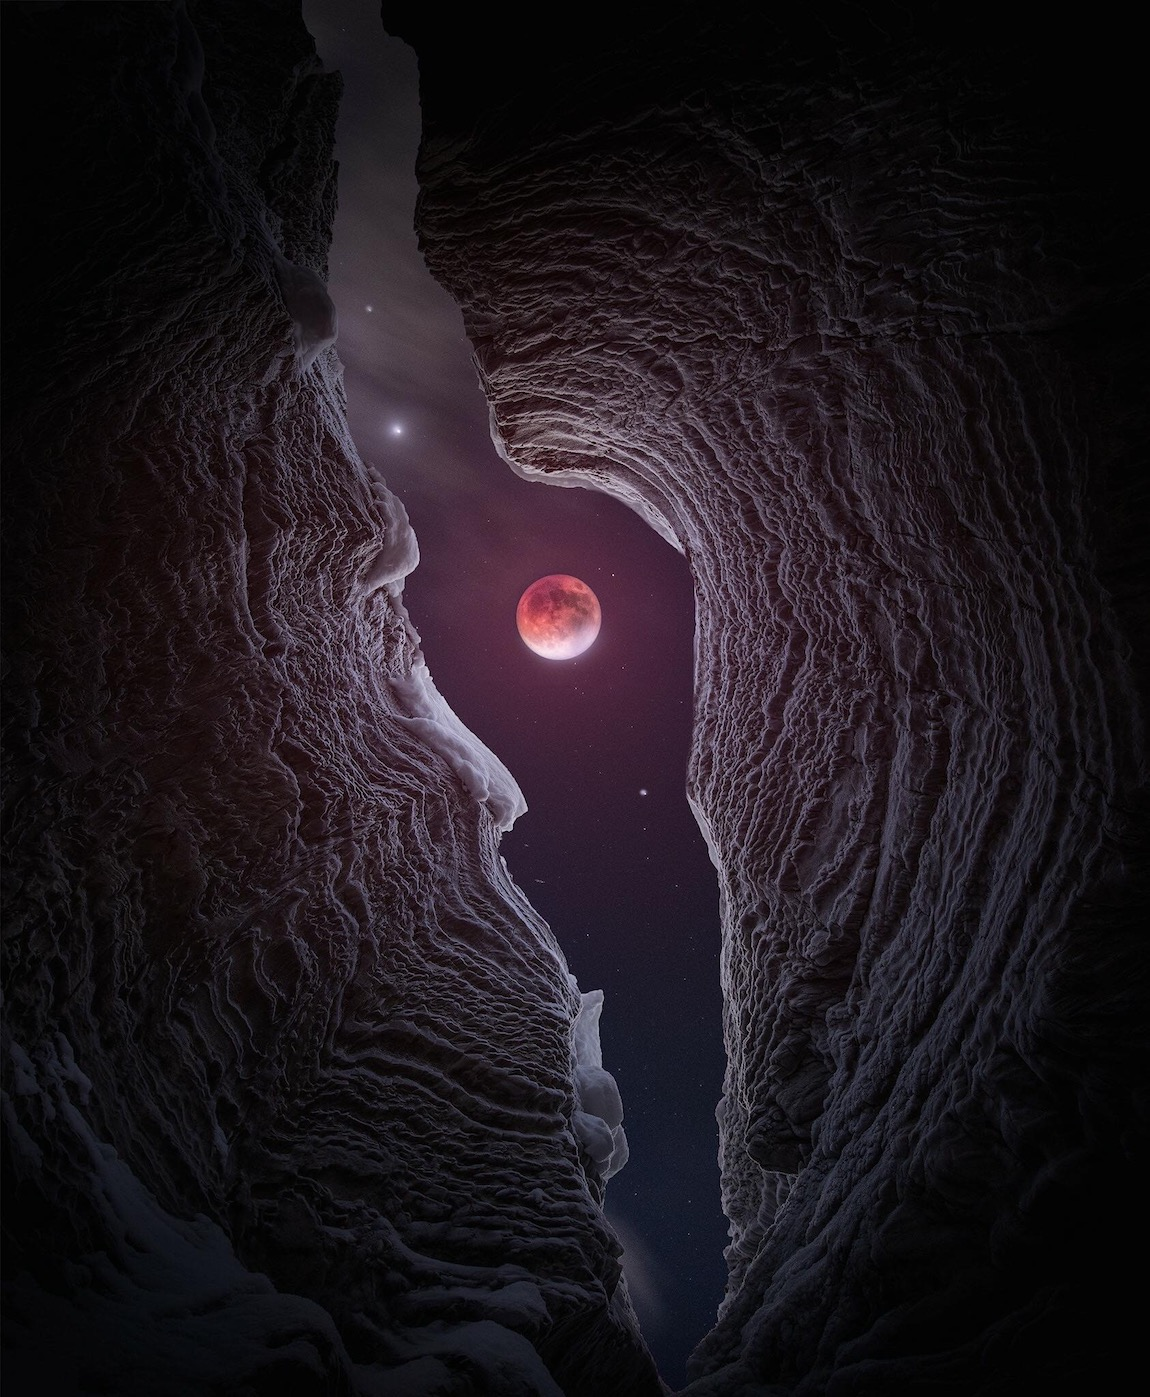 night-landscape-photography-4